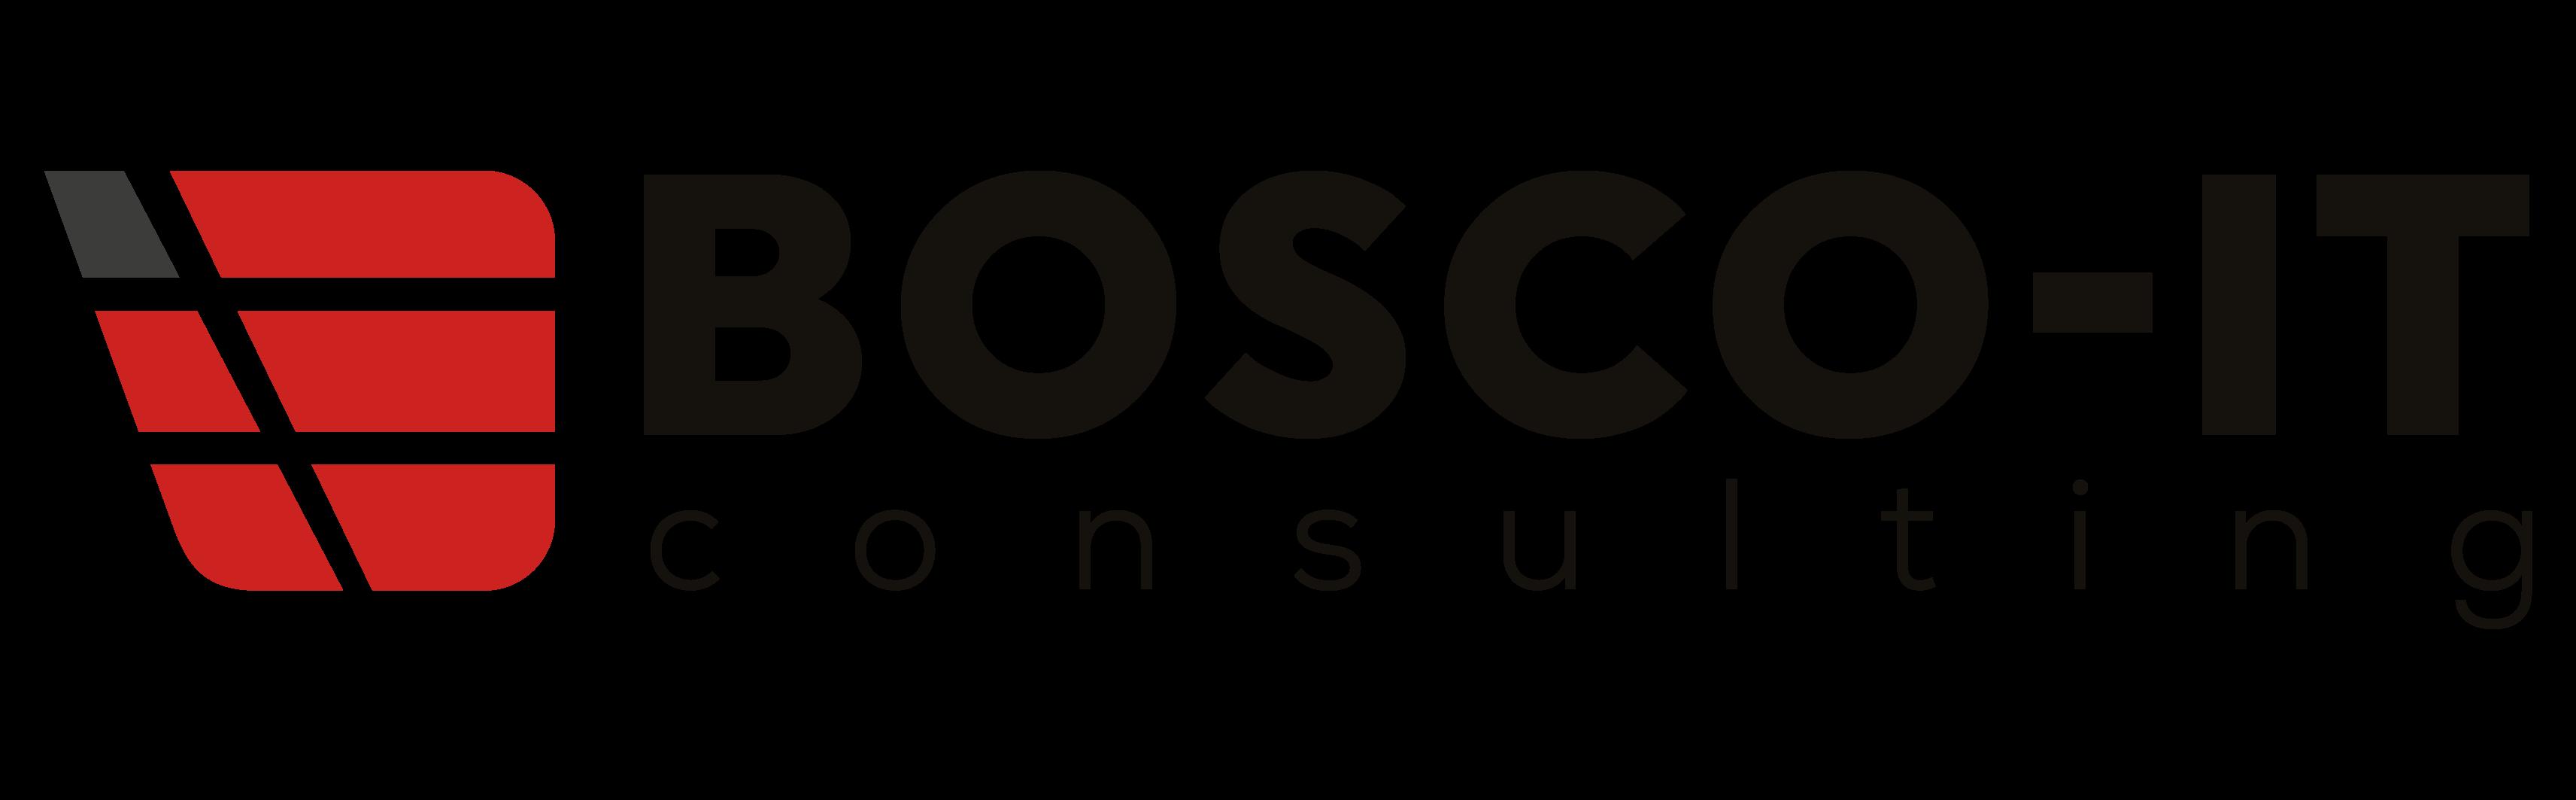 BOSCO-IT CONSULTING Bt.